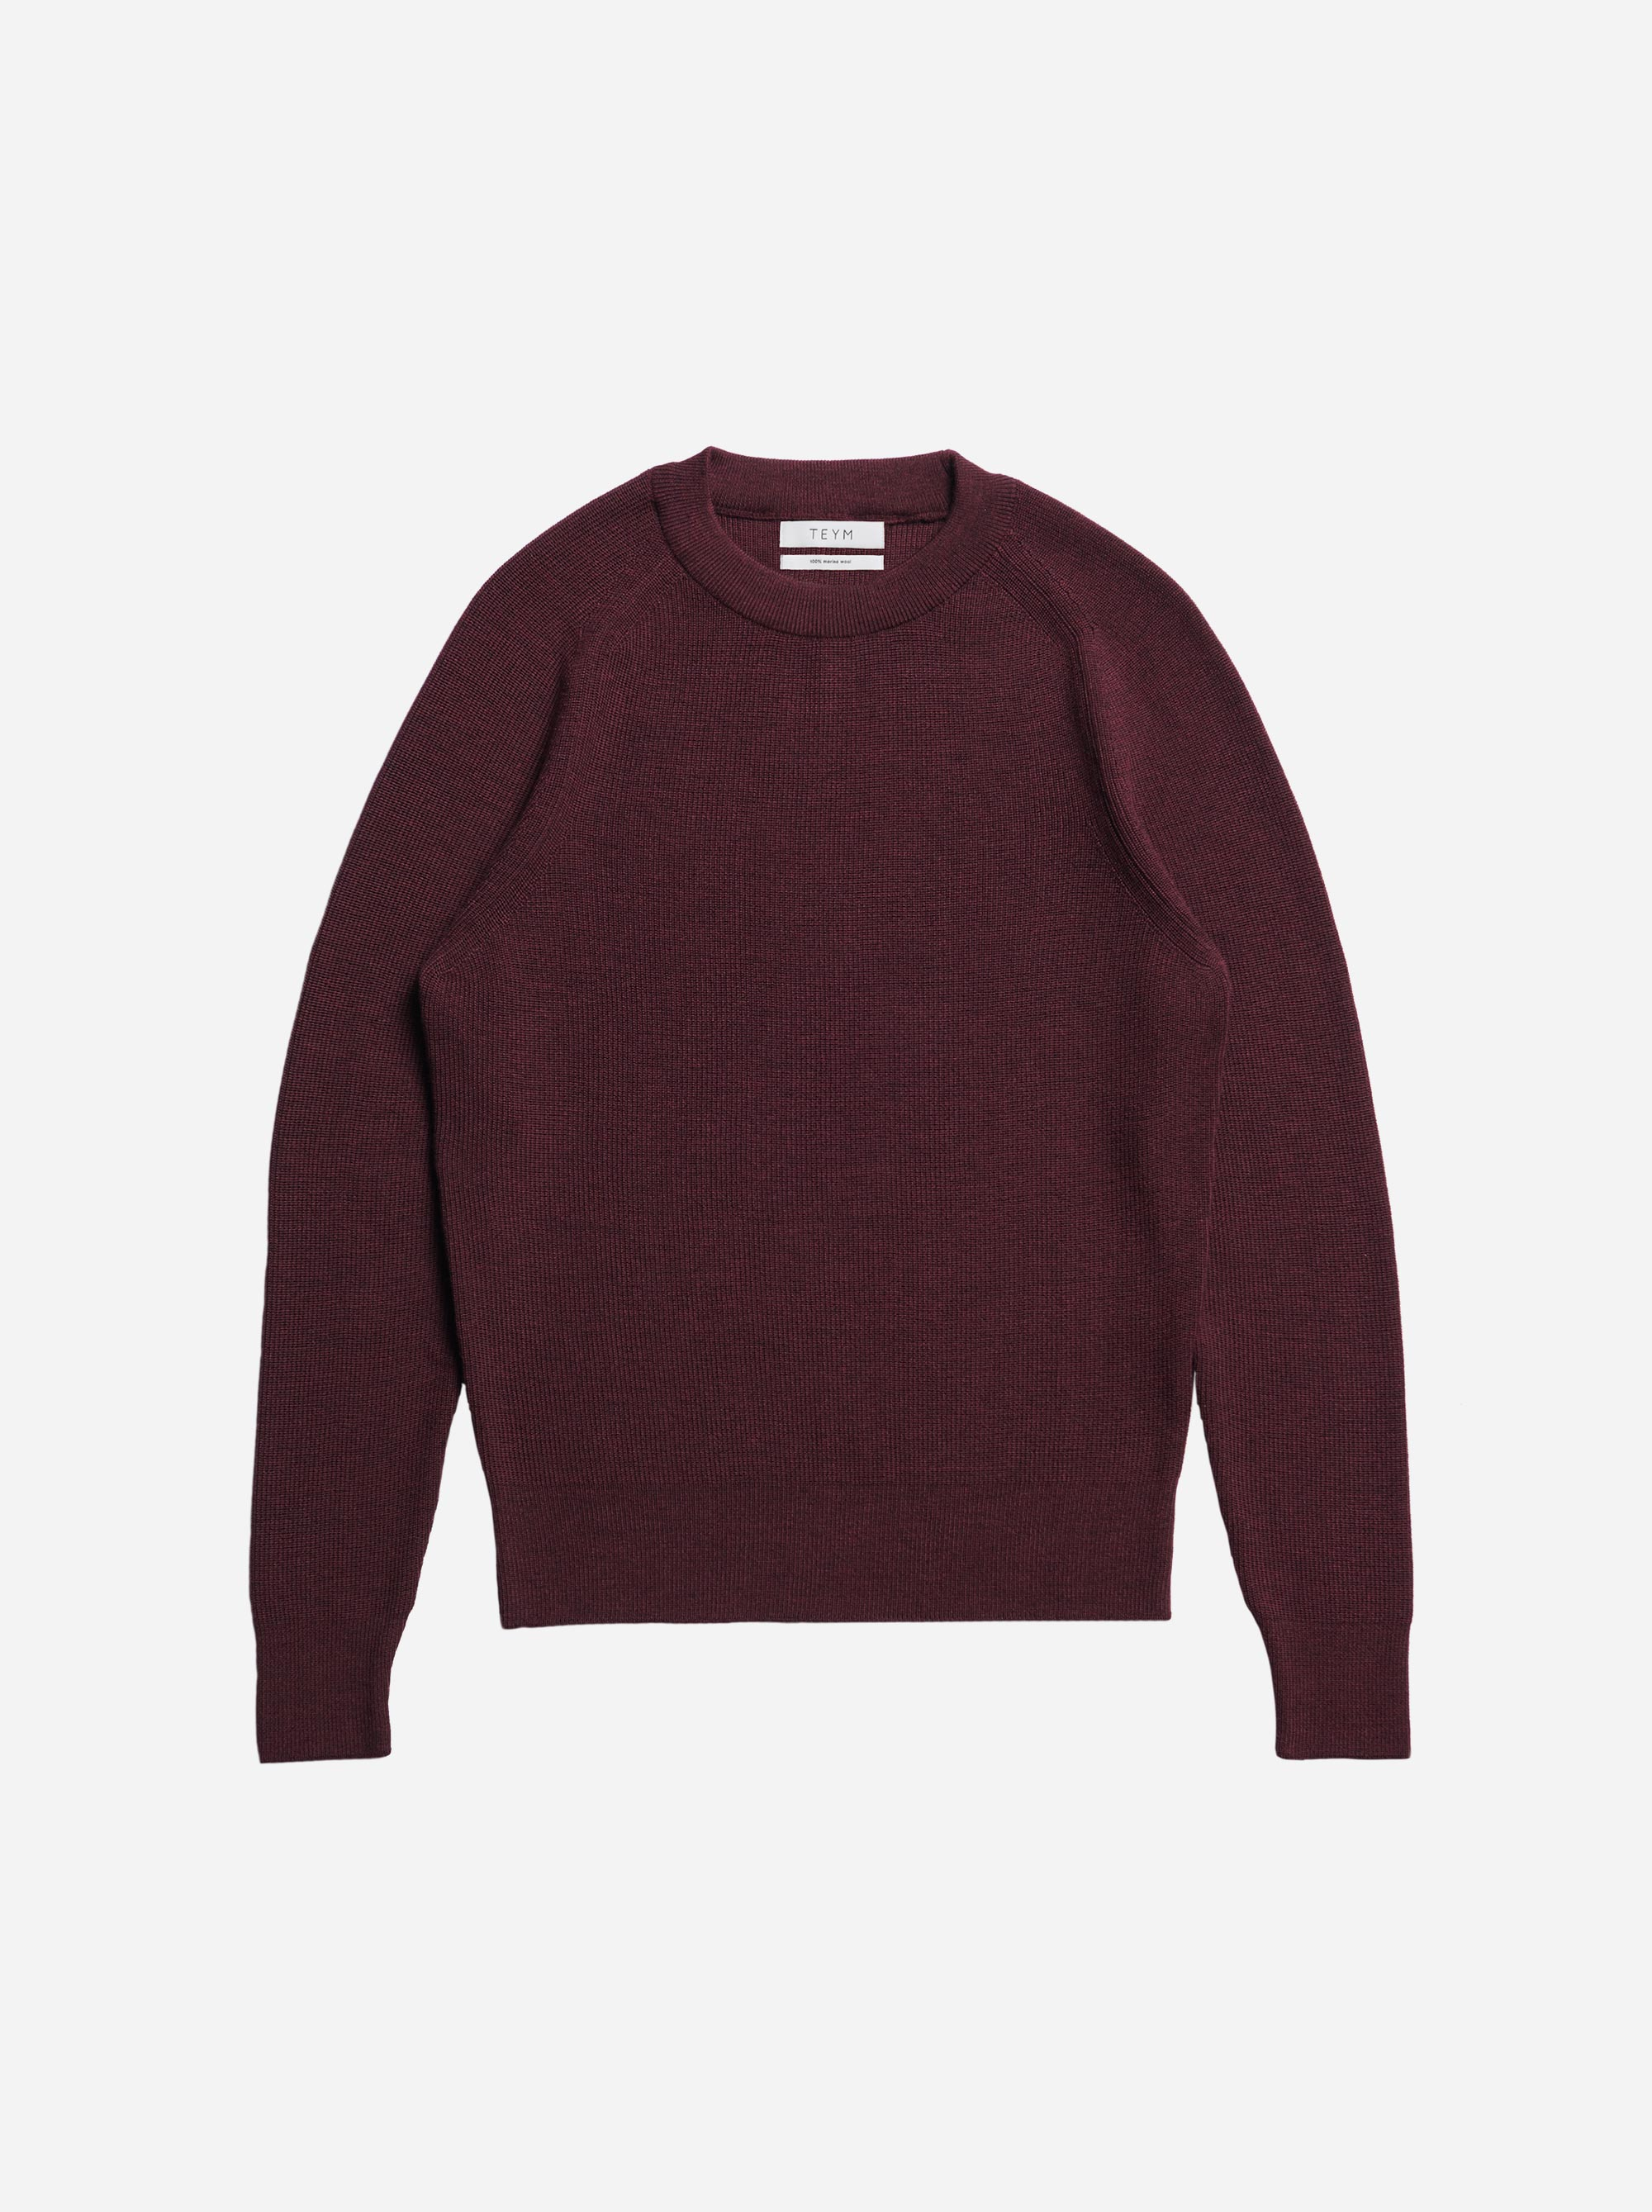 Teym - Crewneck - The Merino Sweater - Women - Burgundy - 5